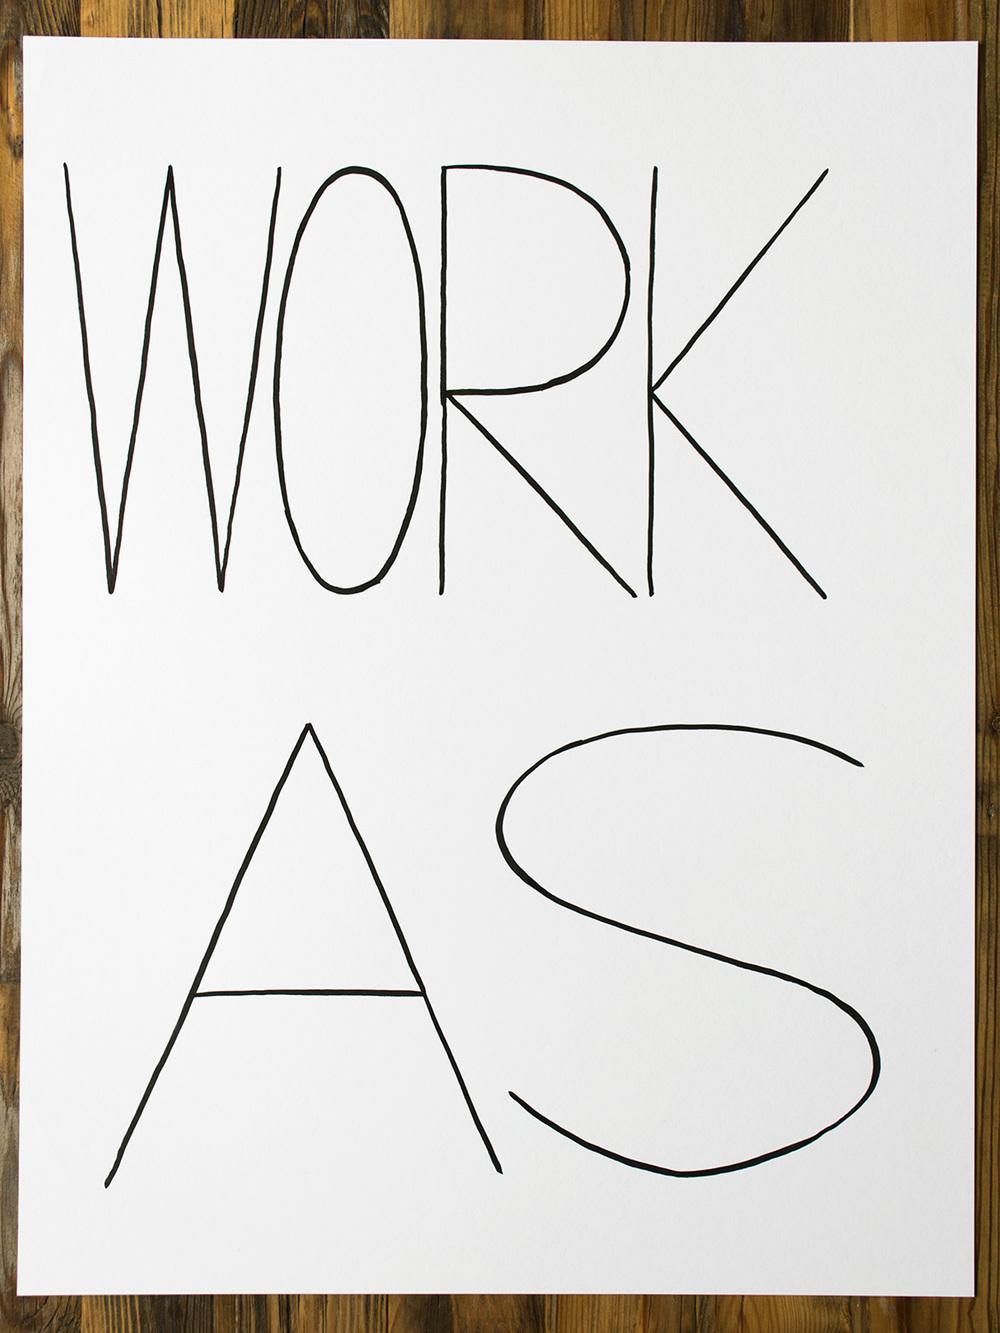 work_as-1500x1125.jpg